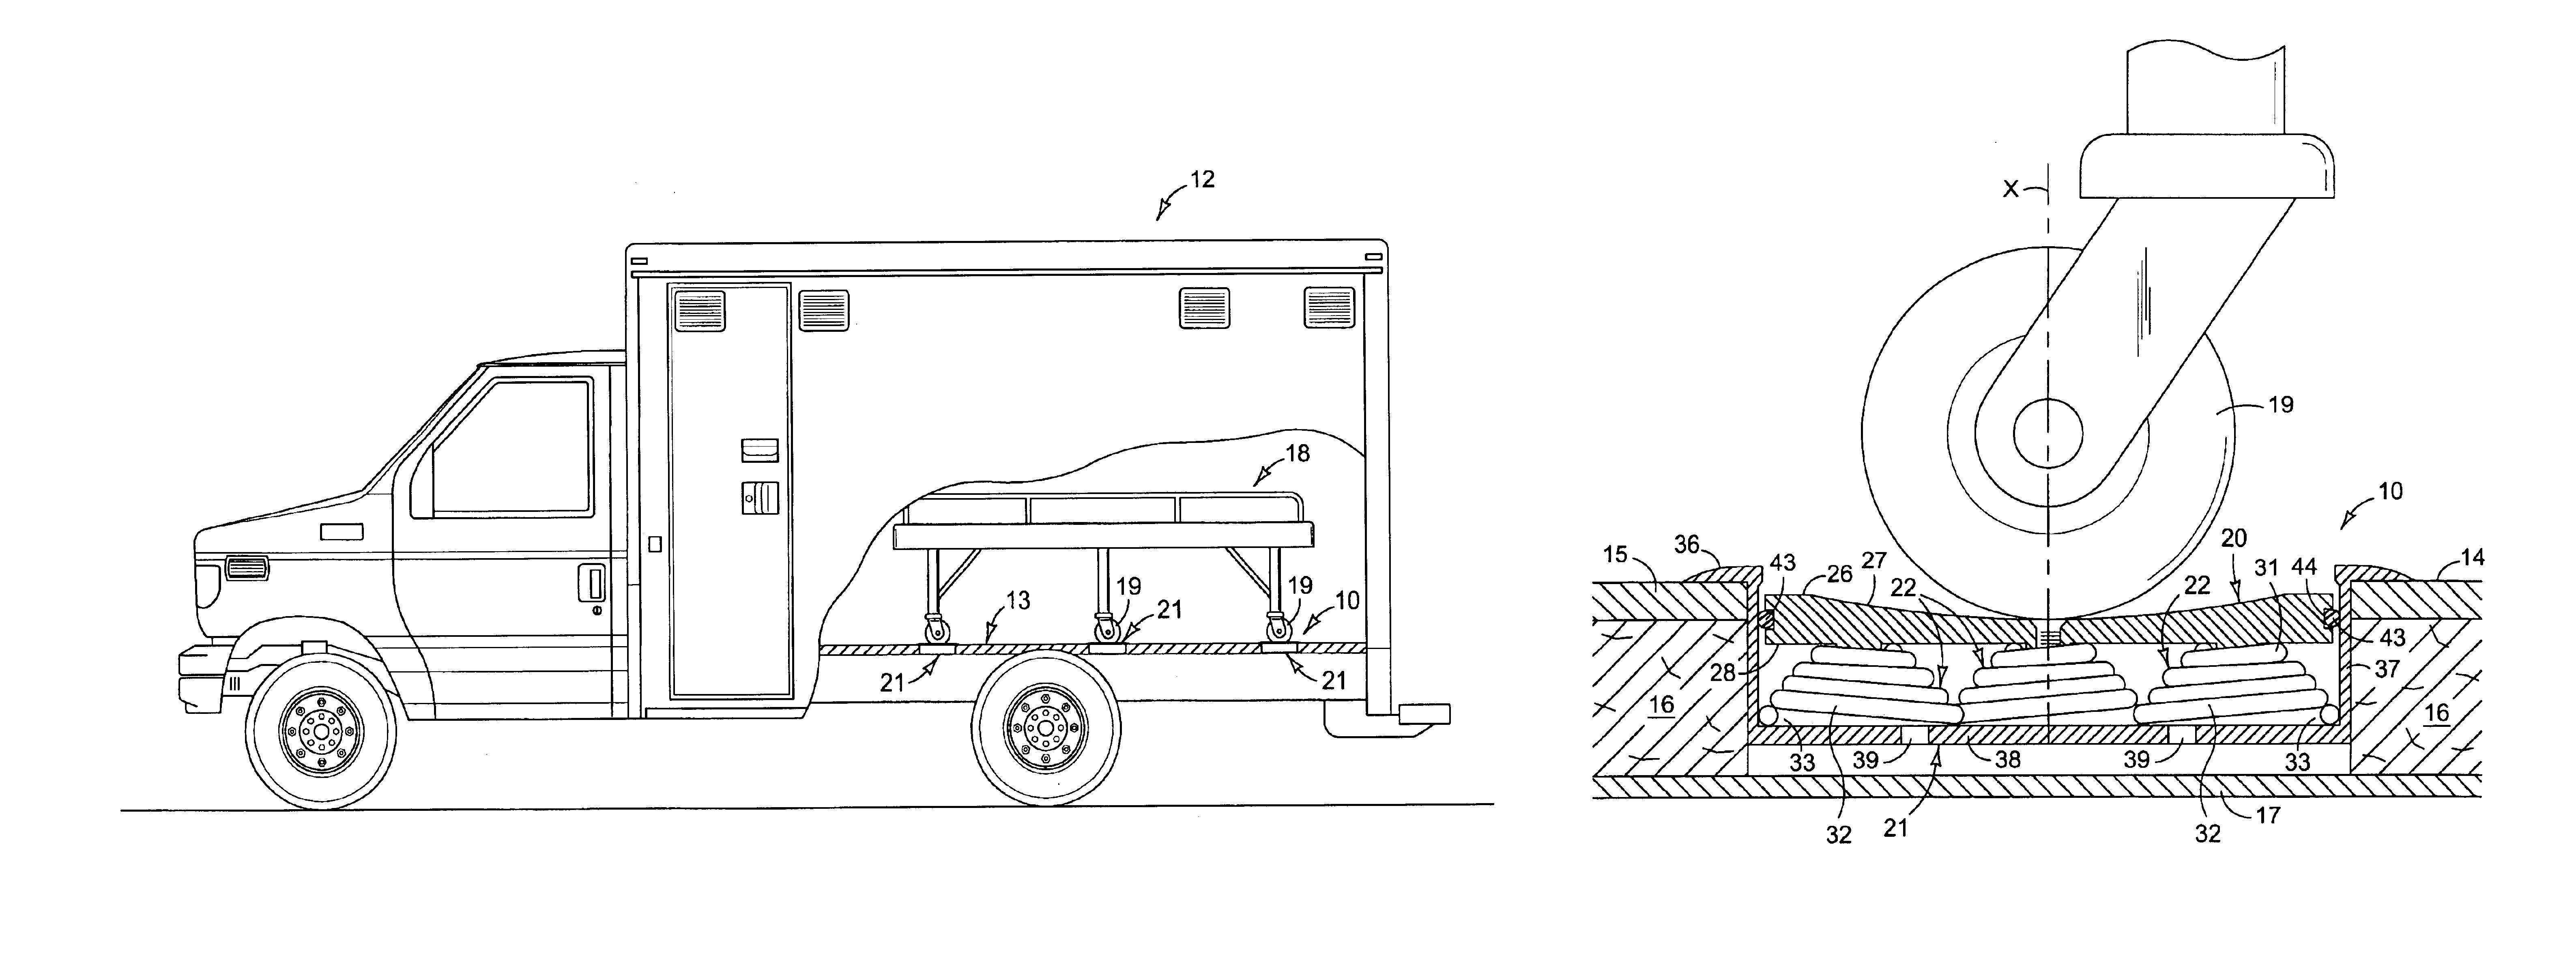 Ambulance Vehicle Dimensions Vehicle Ideas